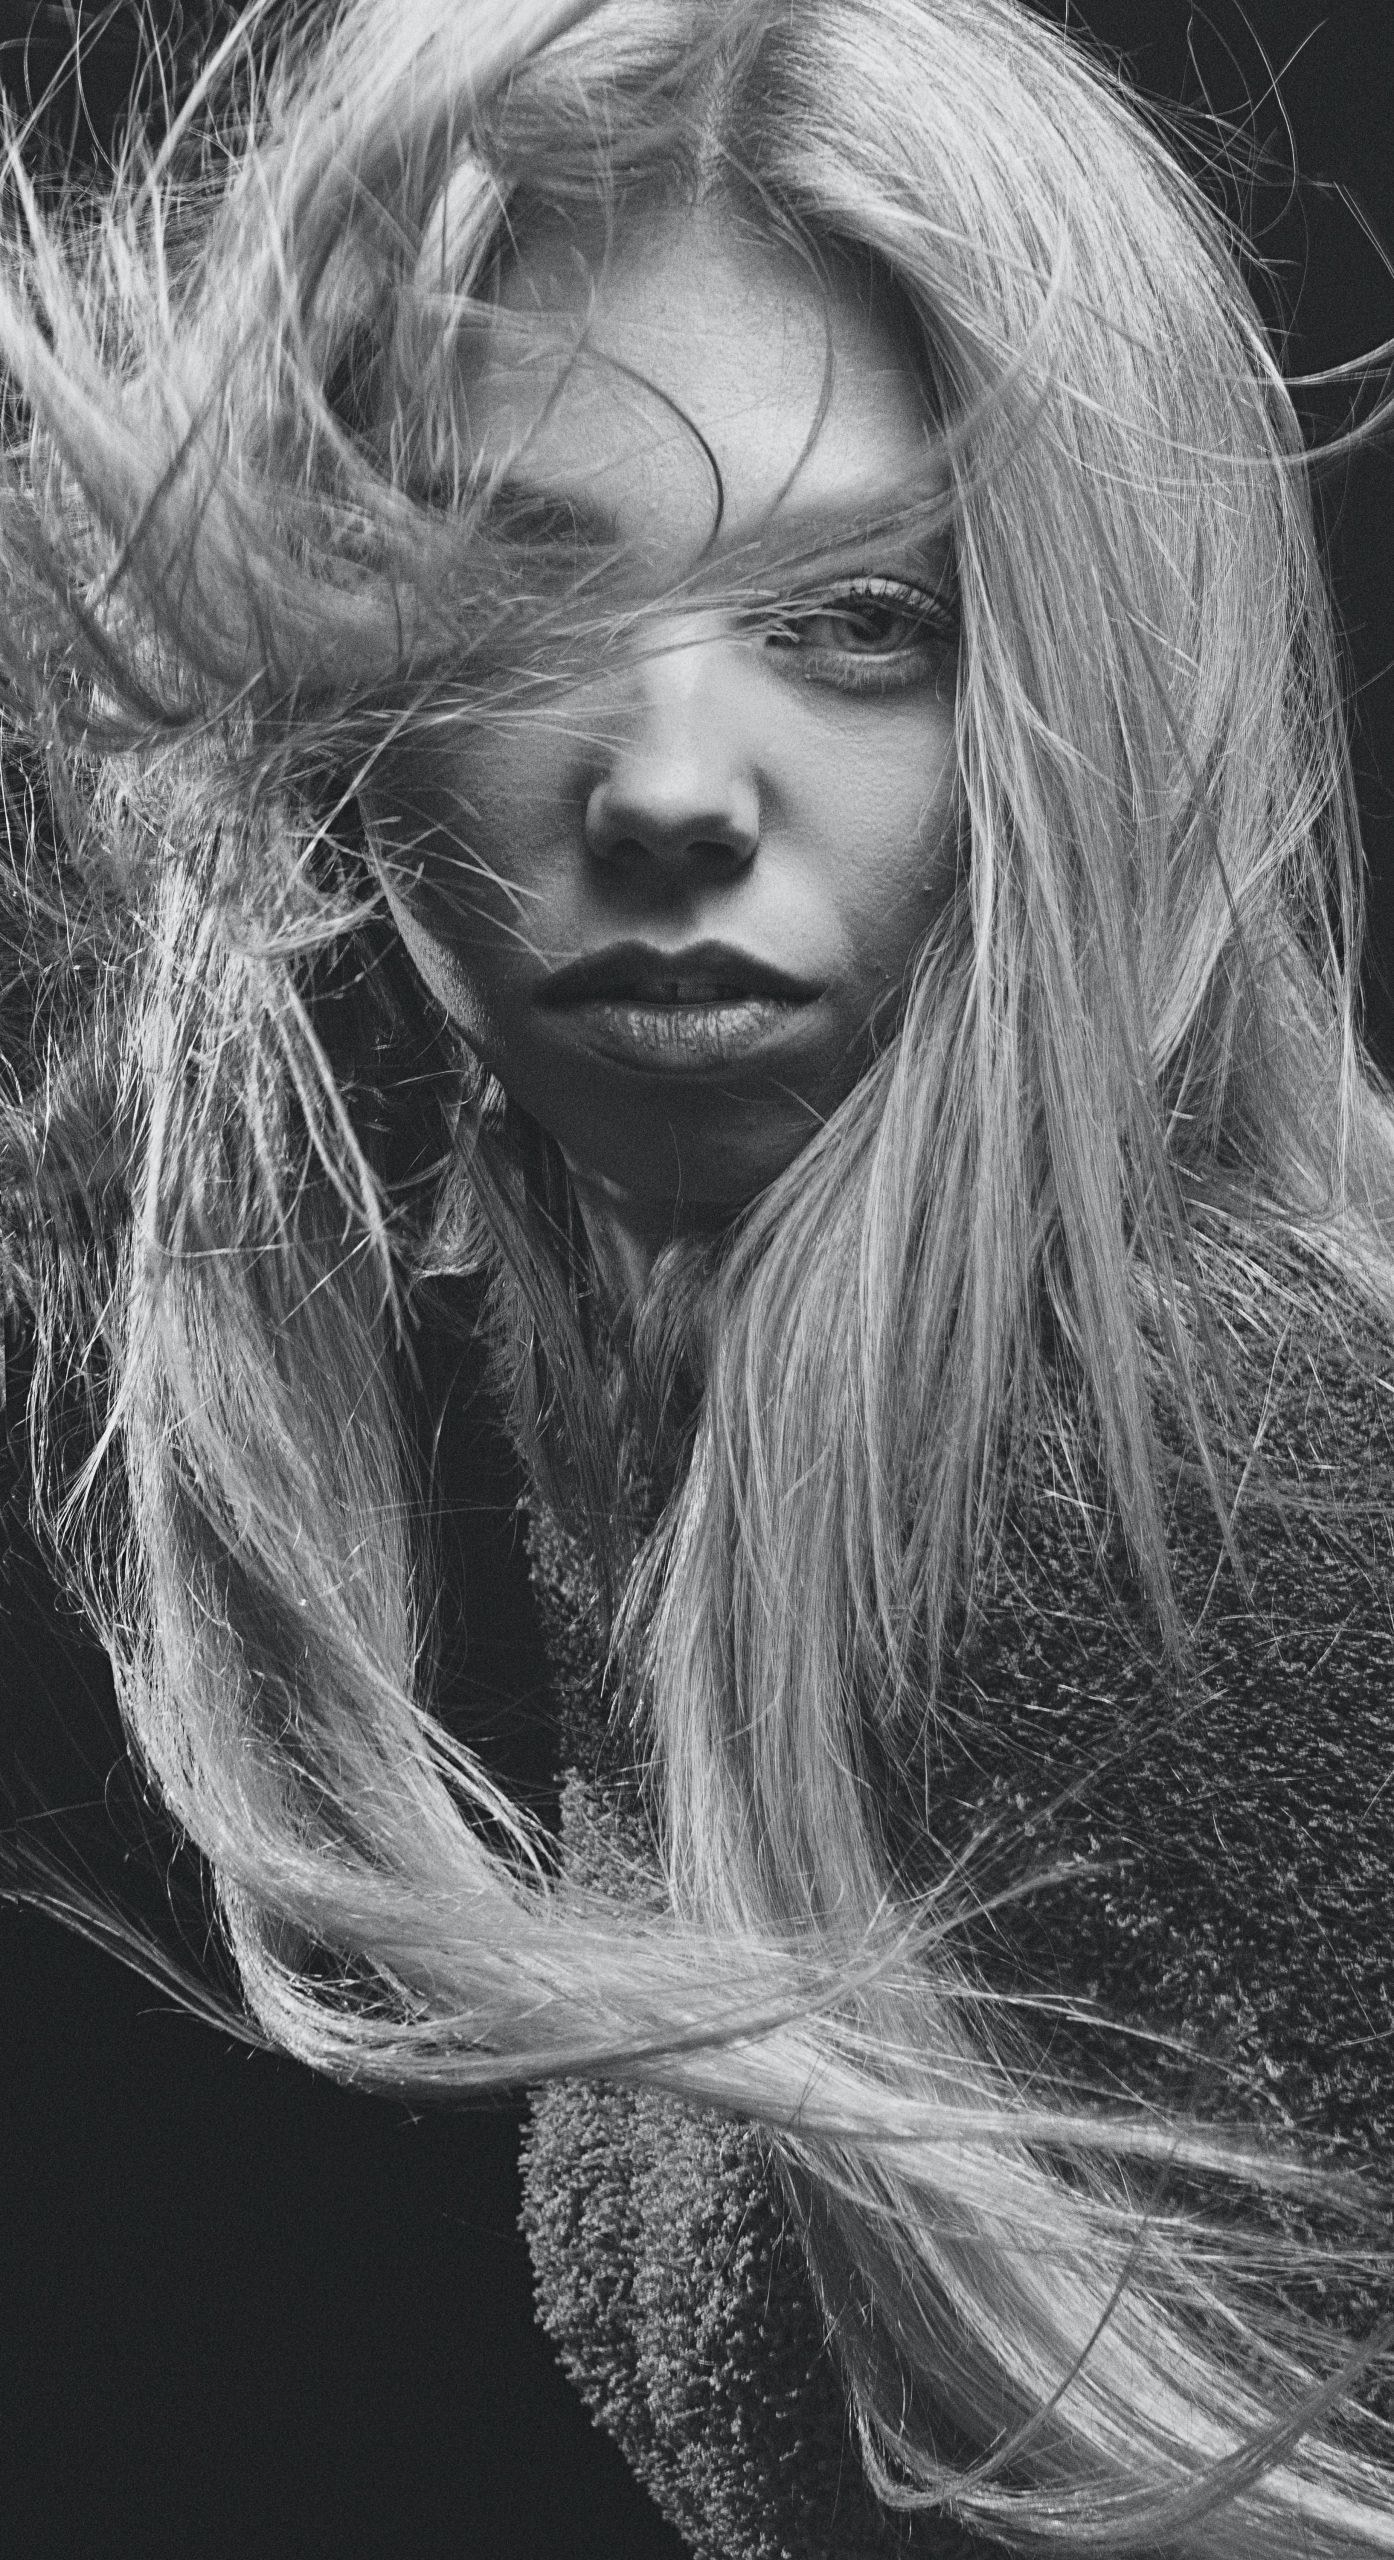 free girl sad face whatsapp dp images